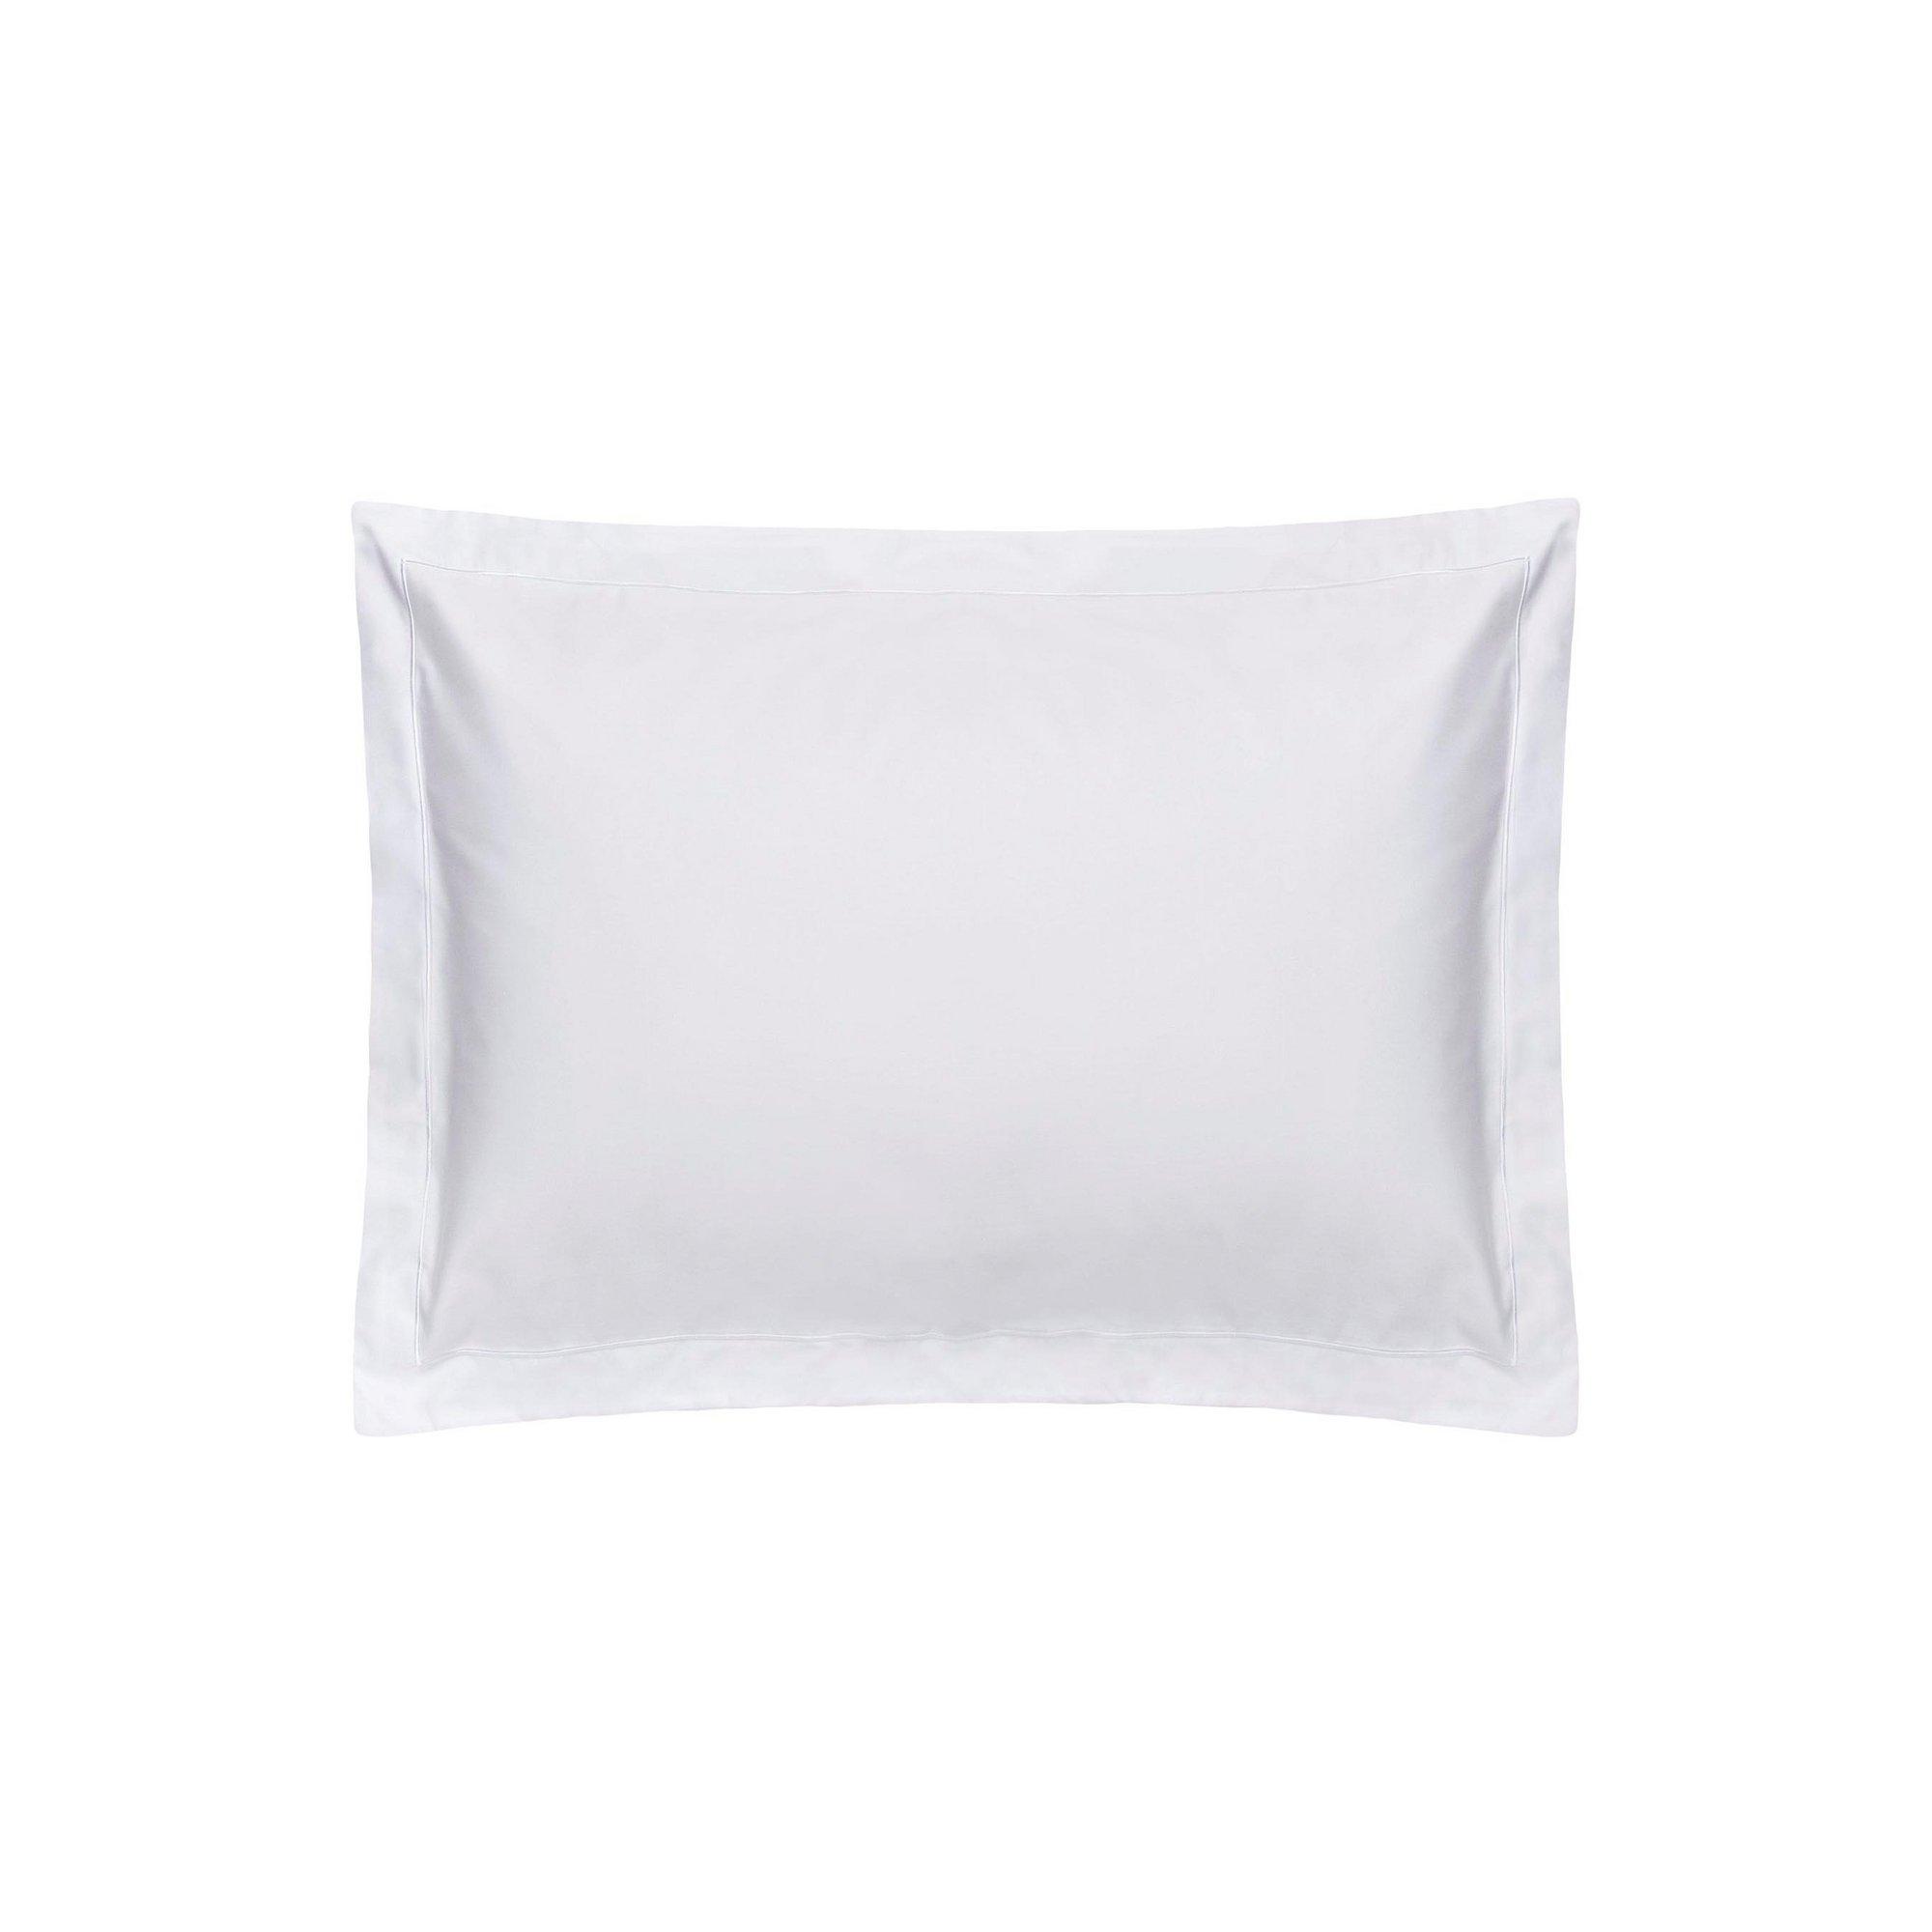 Image of Belledorm Egyptian Cotton Oxford Pillowcase